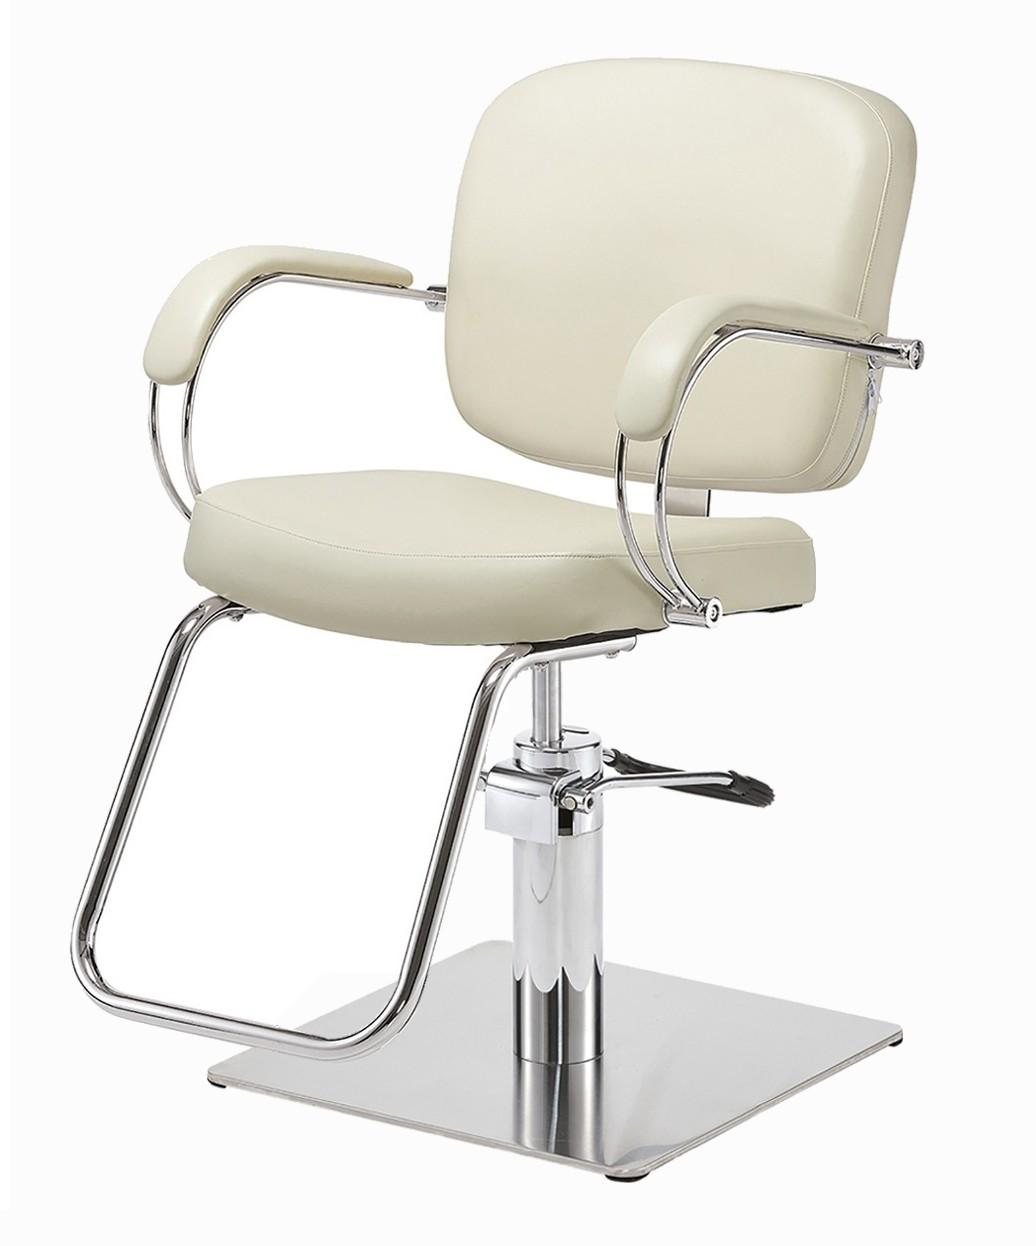 Pibbs 3906 Latina Styling Chair